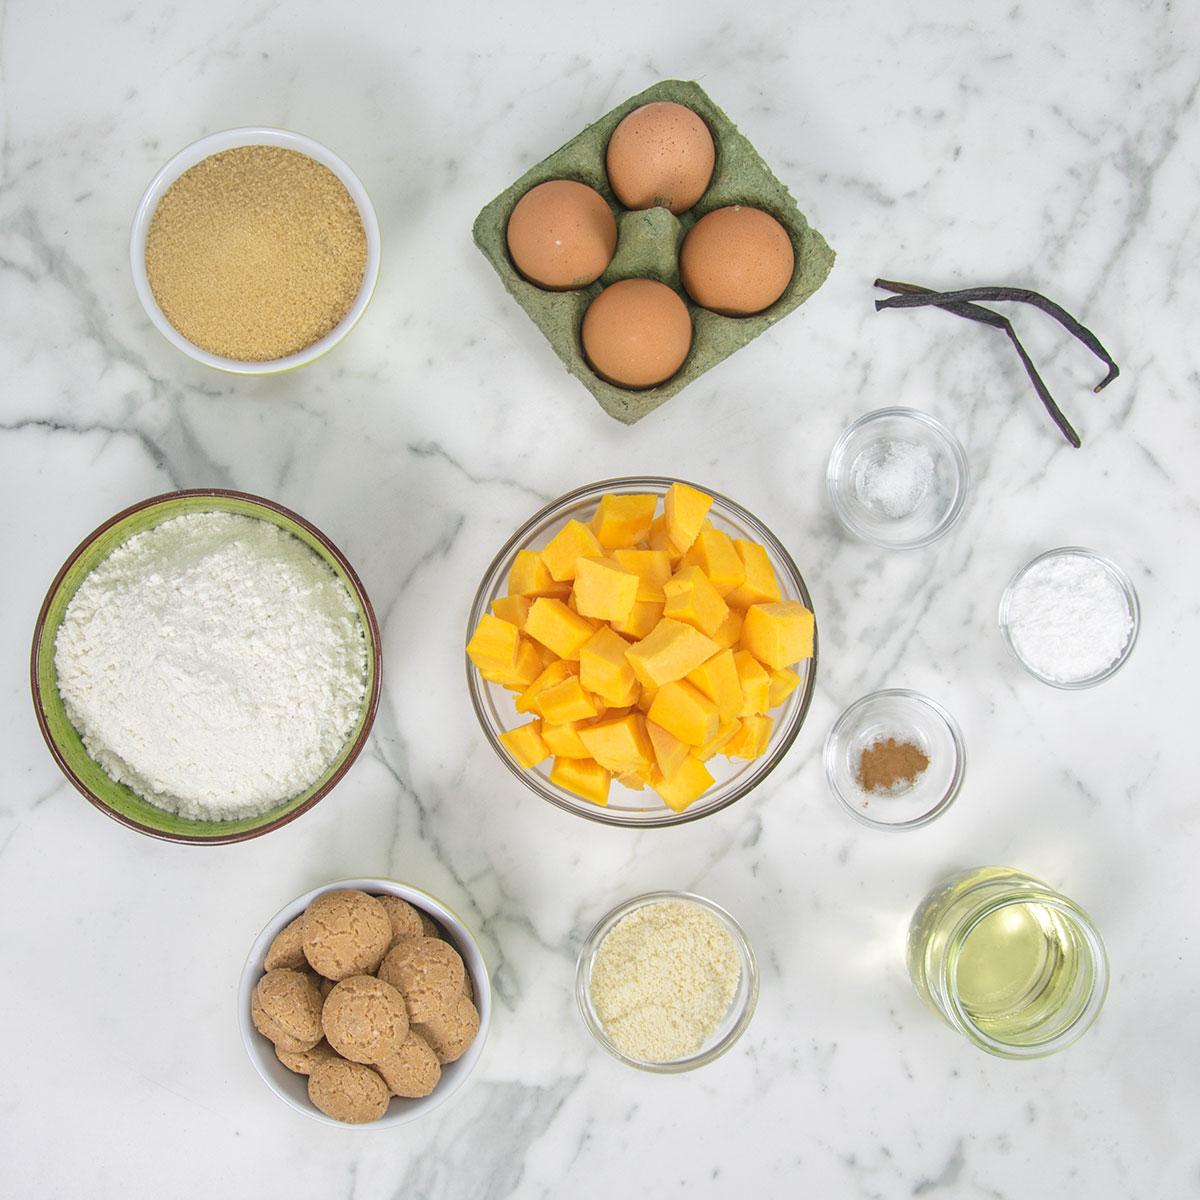 ciambella_zucca_amaretti_ingredienti